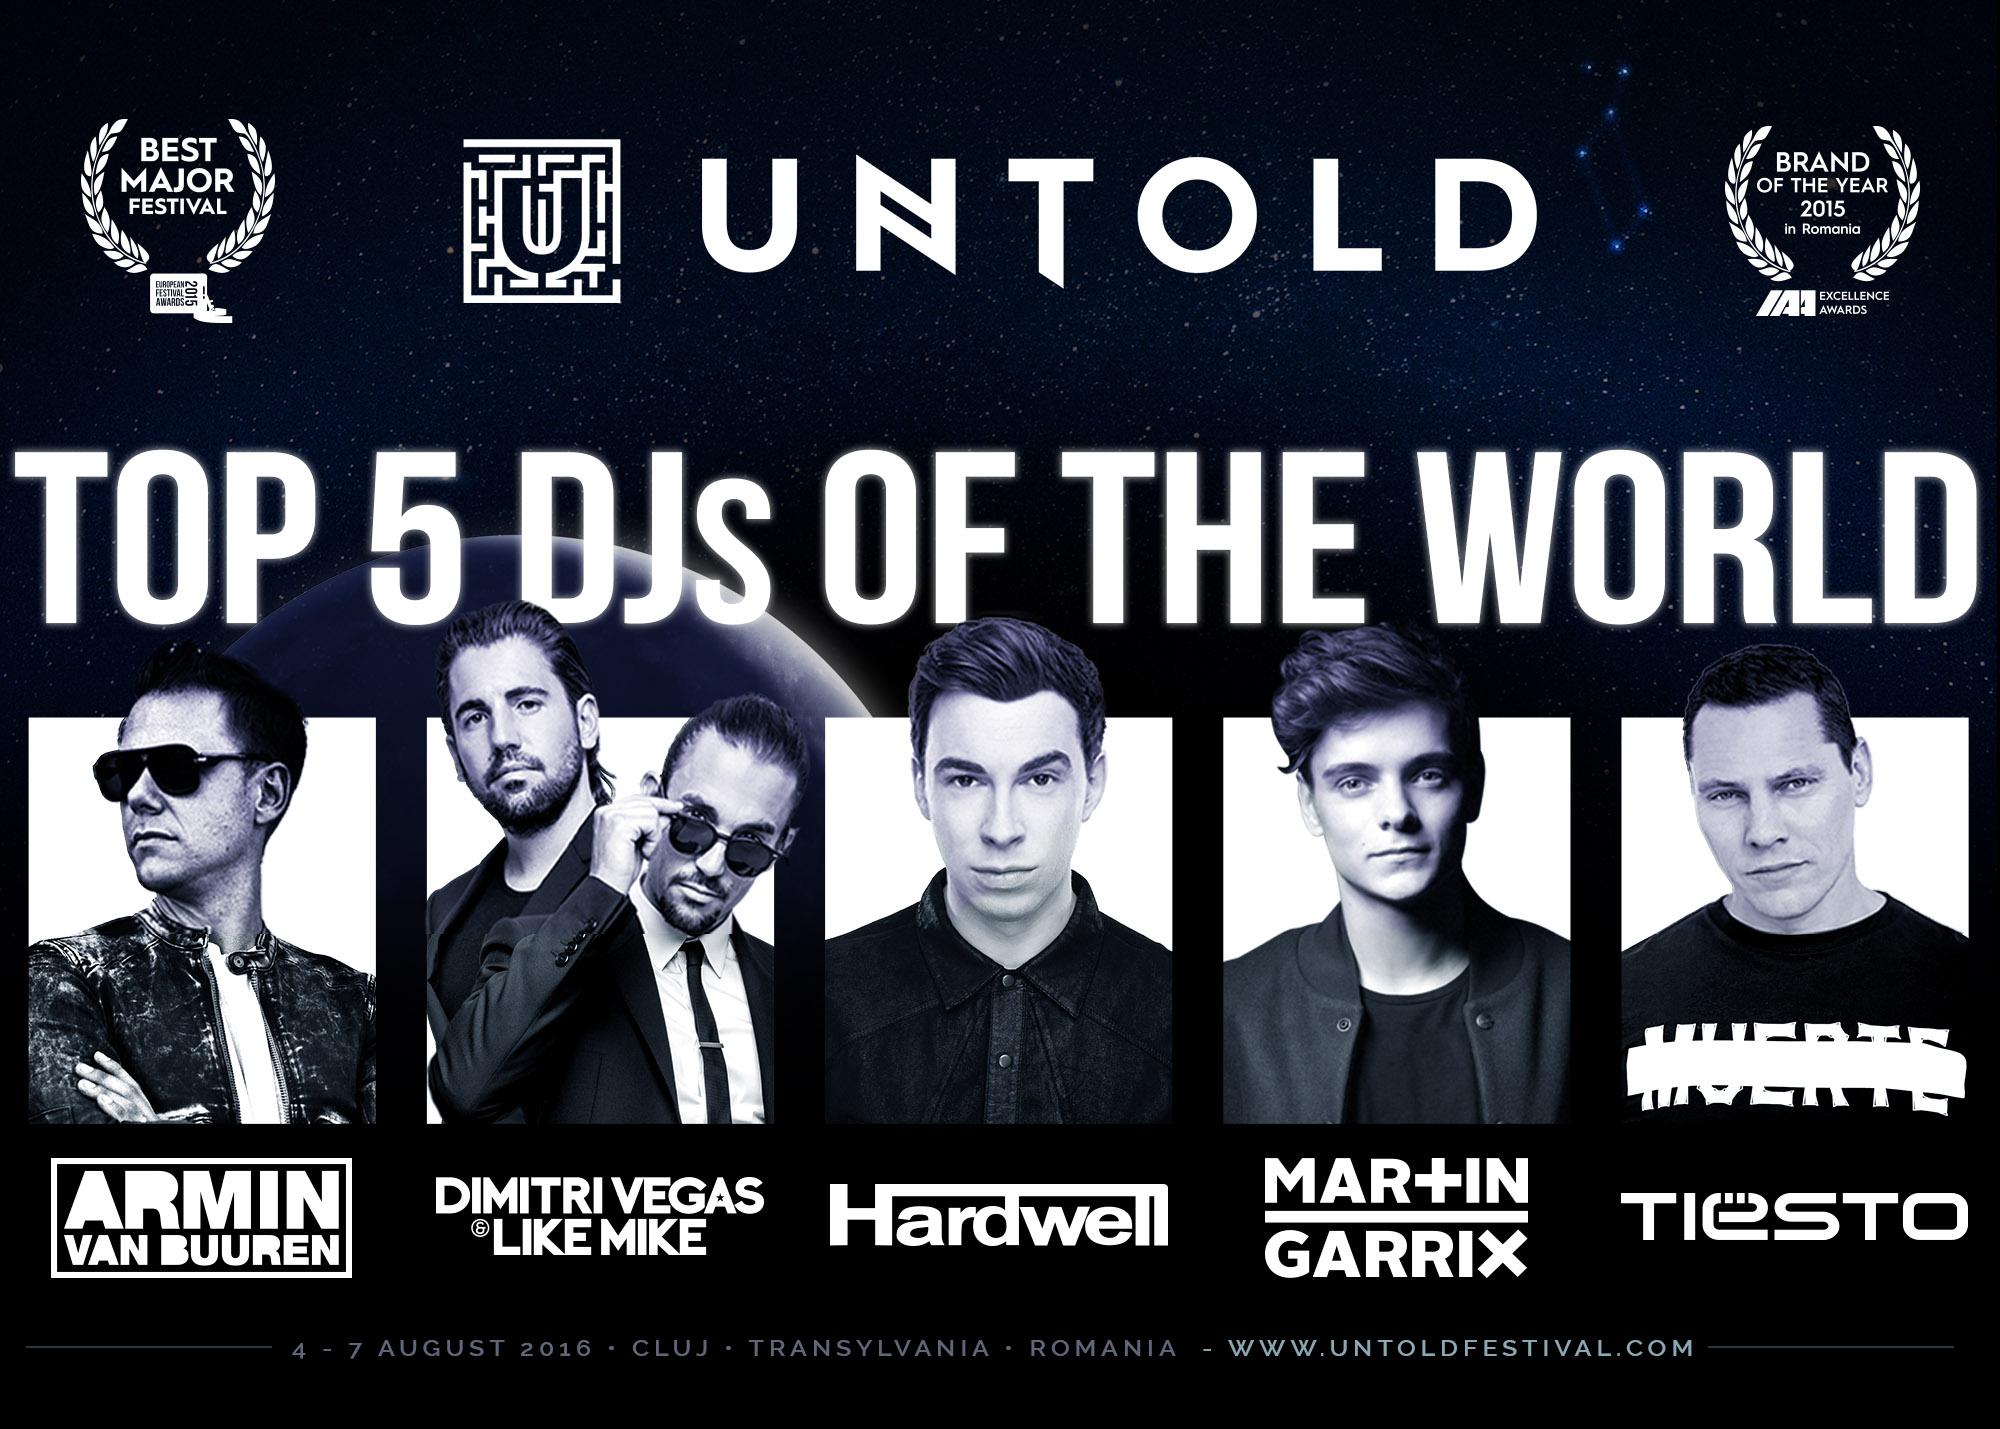 TOP 5 DJ ai lumii, DIMITRI VEGAS&LIKE MIKE, ARMIN van BUUREN, HARDWELL, MARTIN GARRIX si TIESTO la UNTOLD 2016!